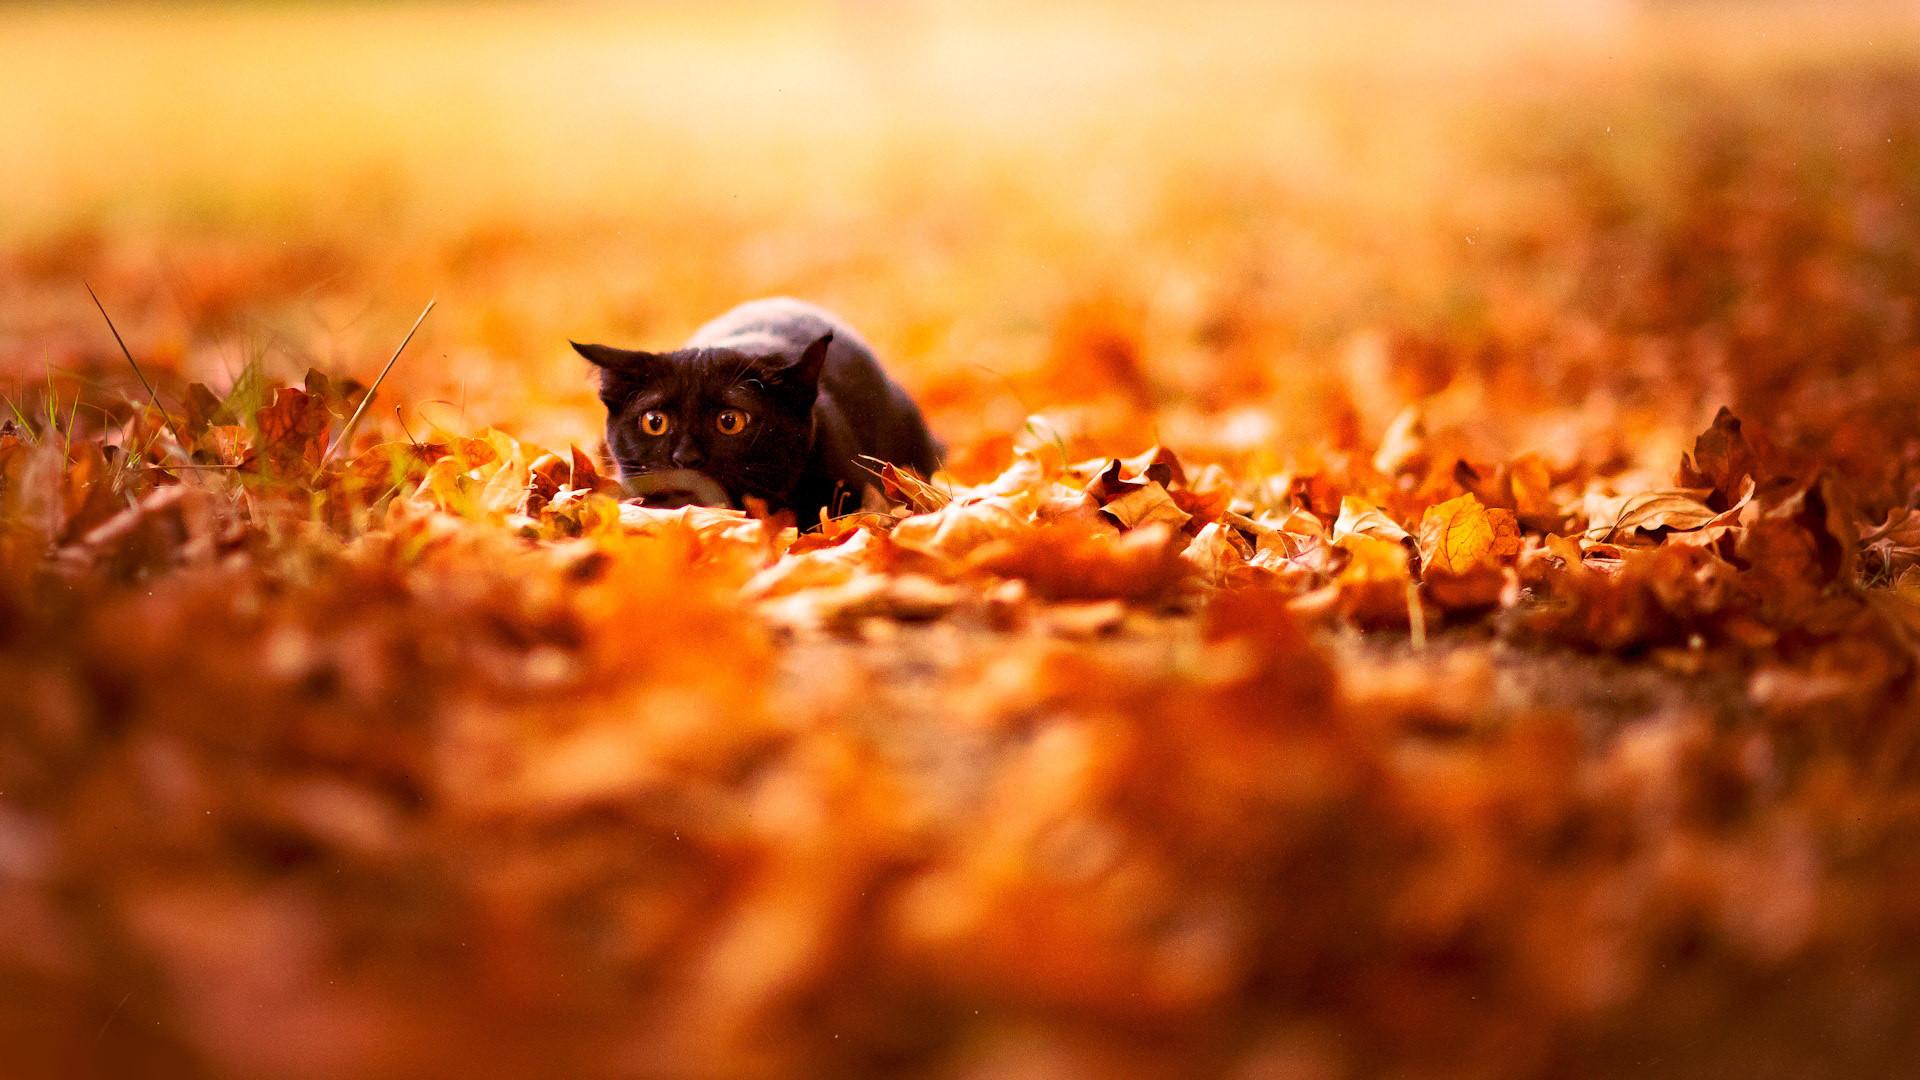 Fall Leaves Desktop Wallpaper Backgrounds Desktop Wallpaper Autumn Leaves 65 Images